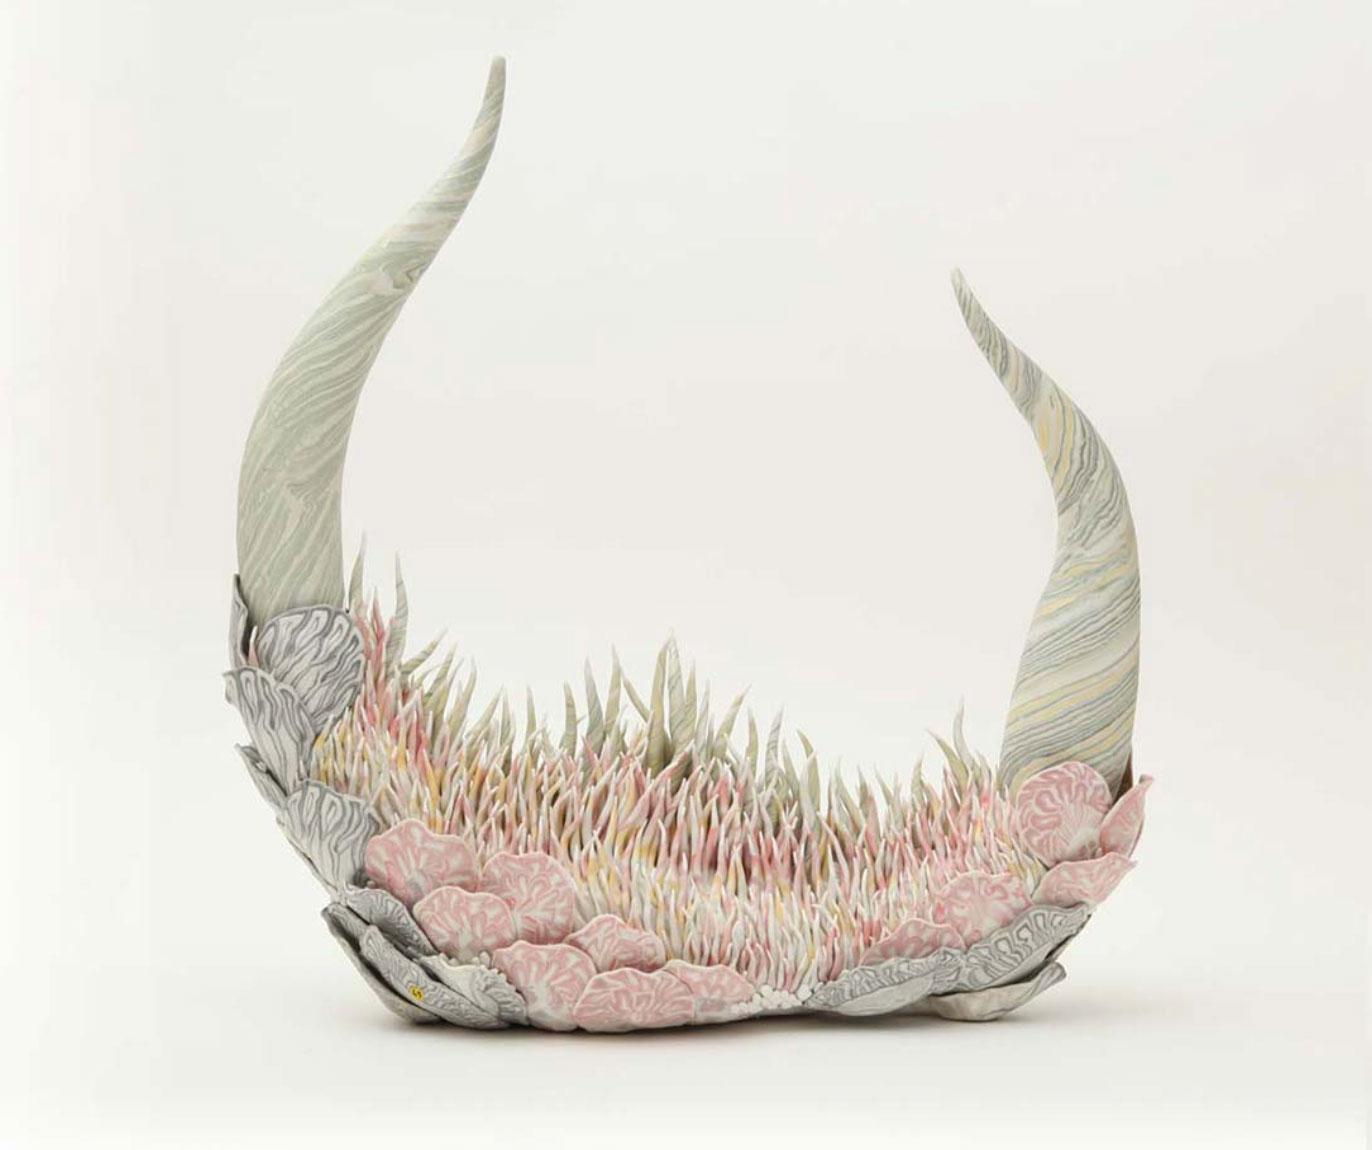 Konno Tomoko - Ceramic artist - Organic sculptures